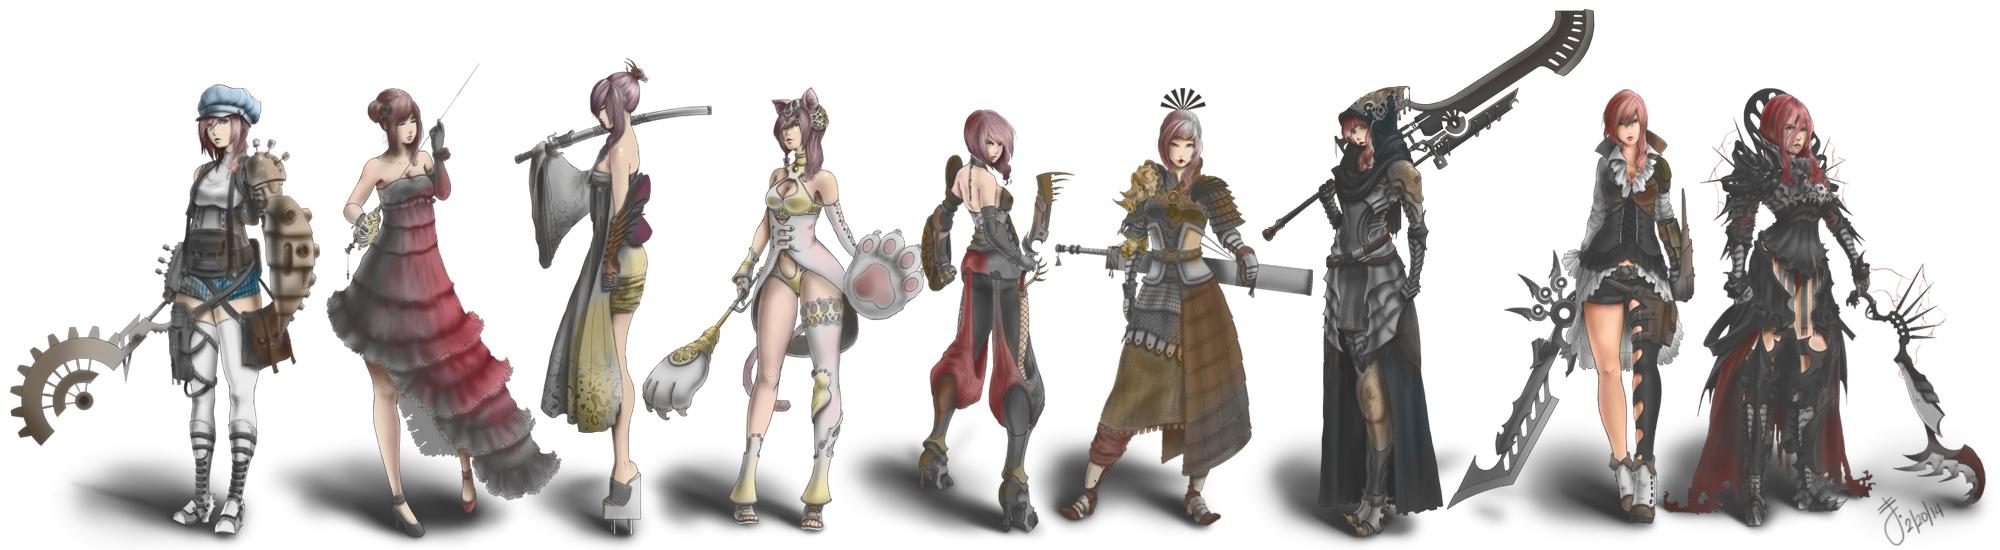 Ffx buy armor 4 slots